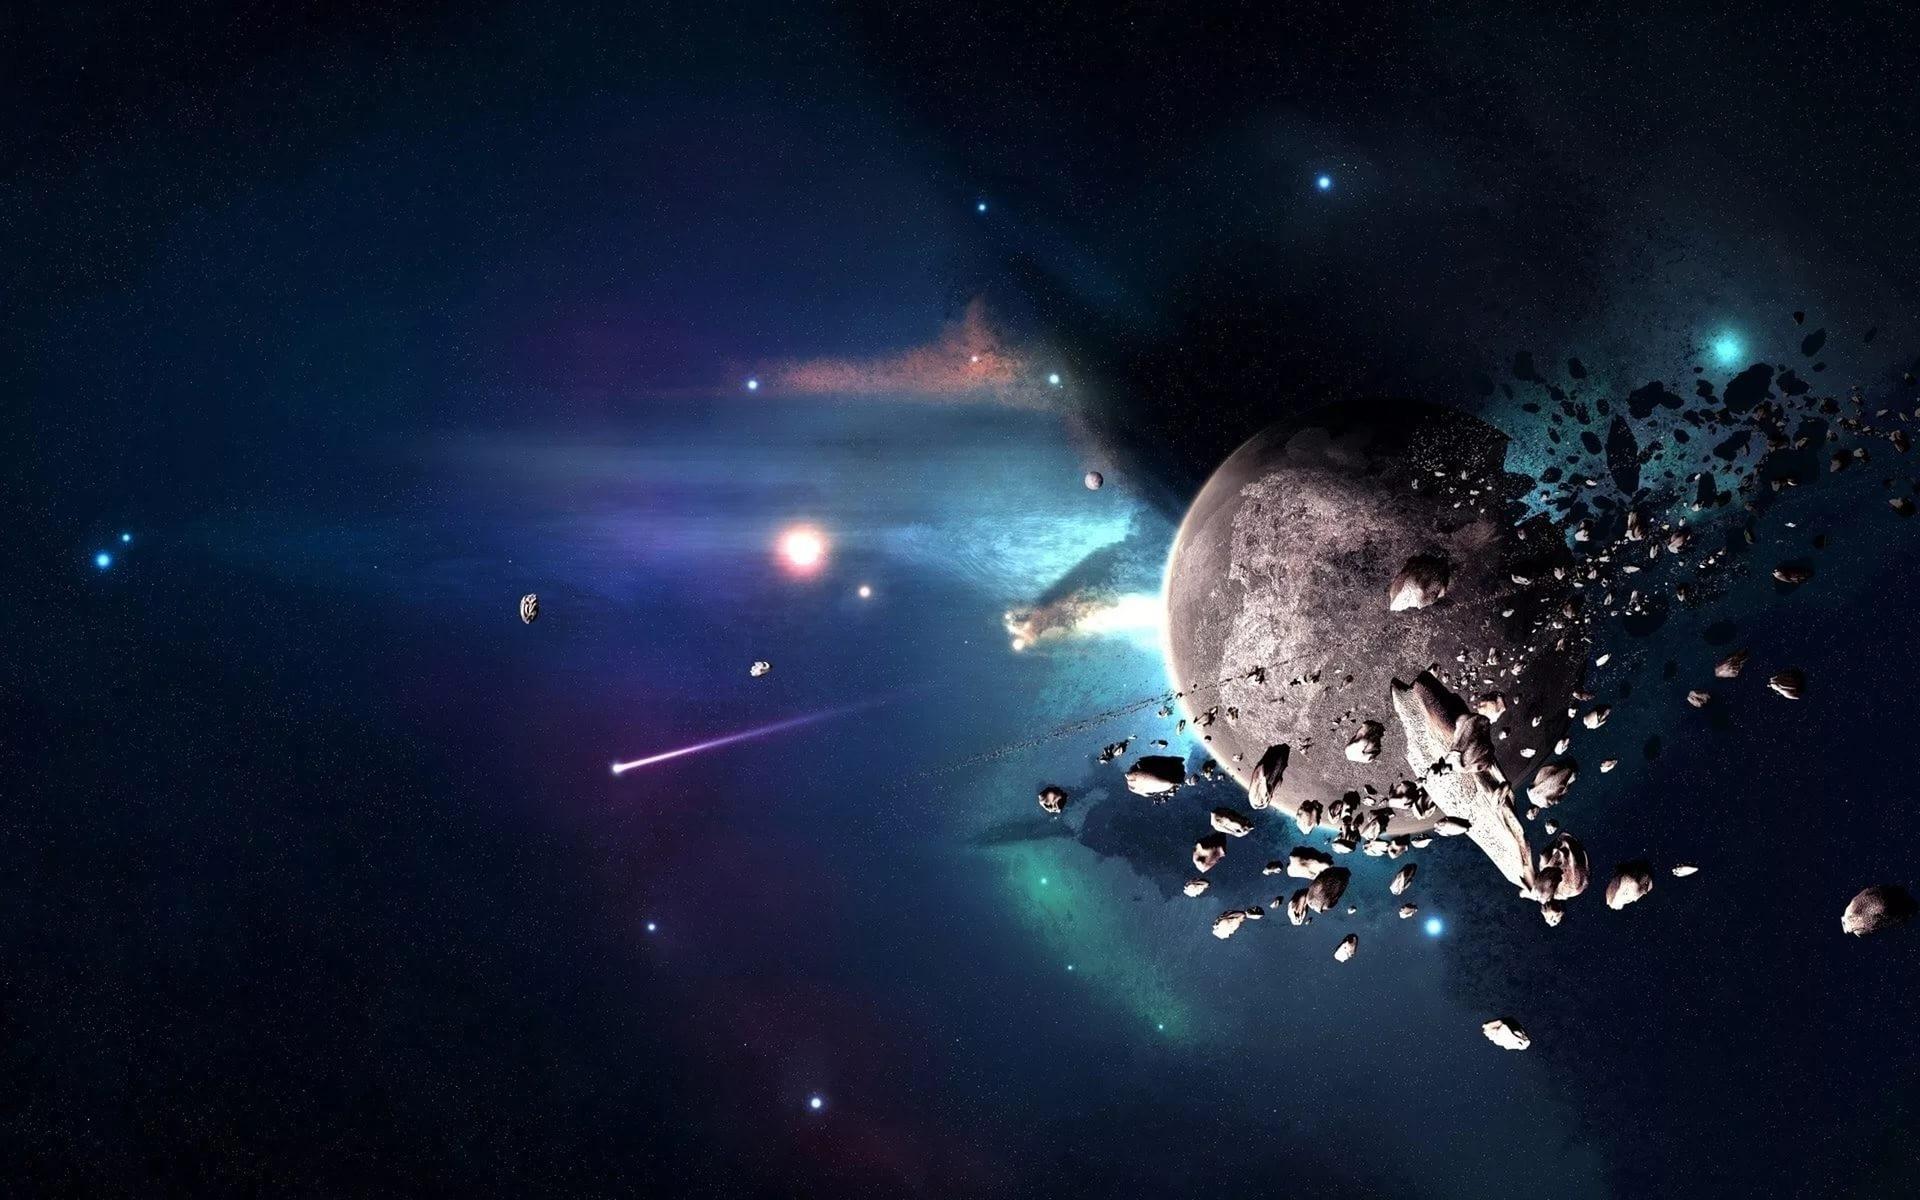 Сразу два НЛО попали вобъектив камеры МКС